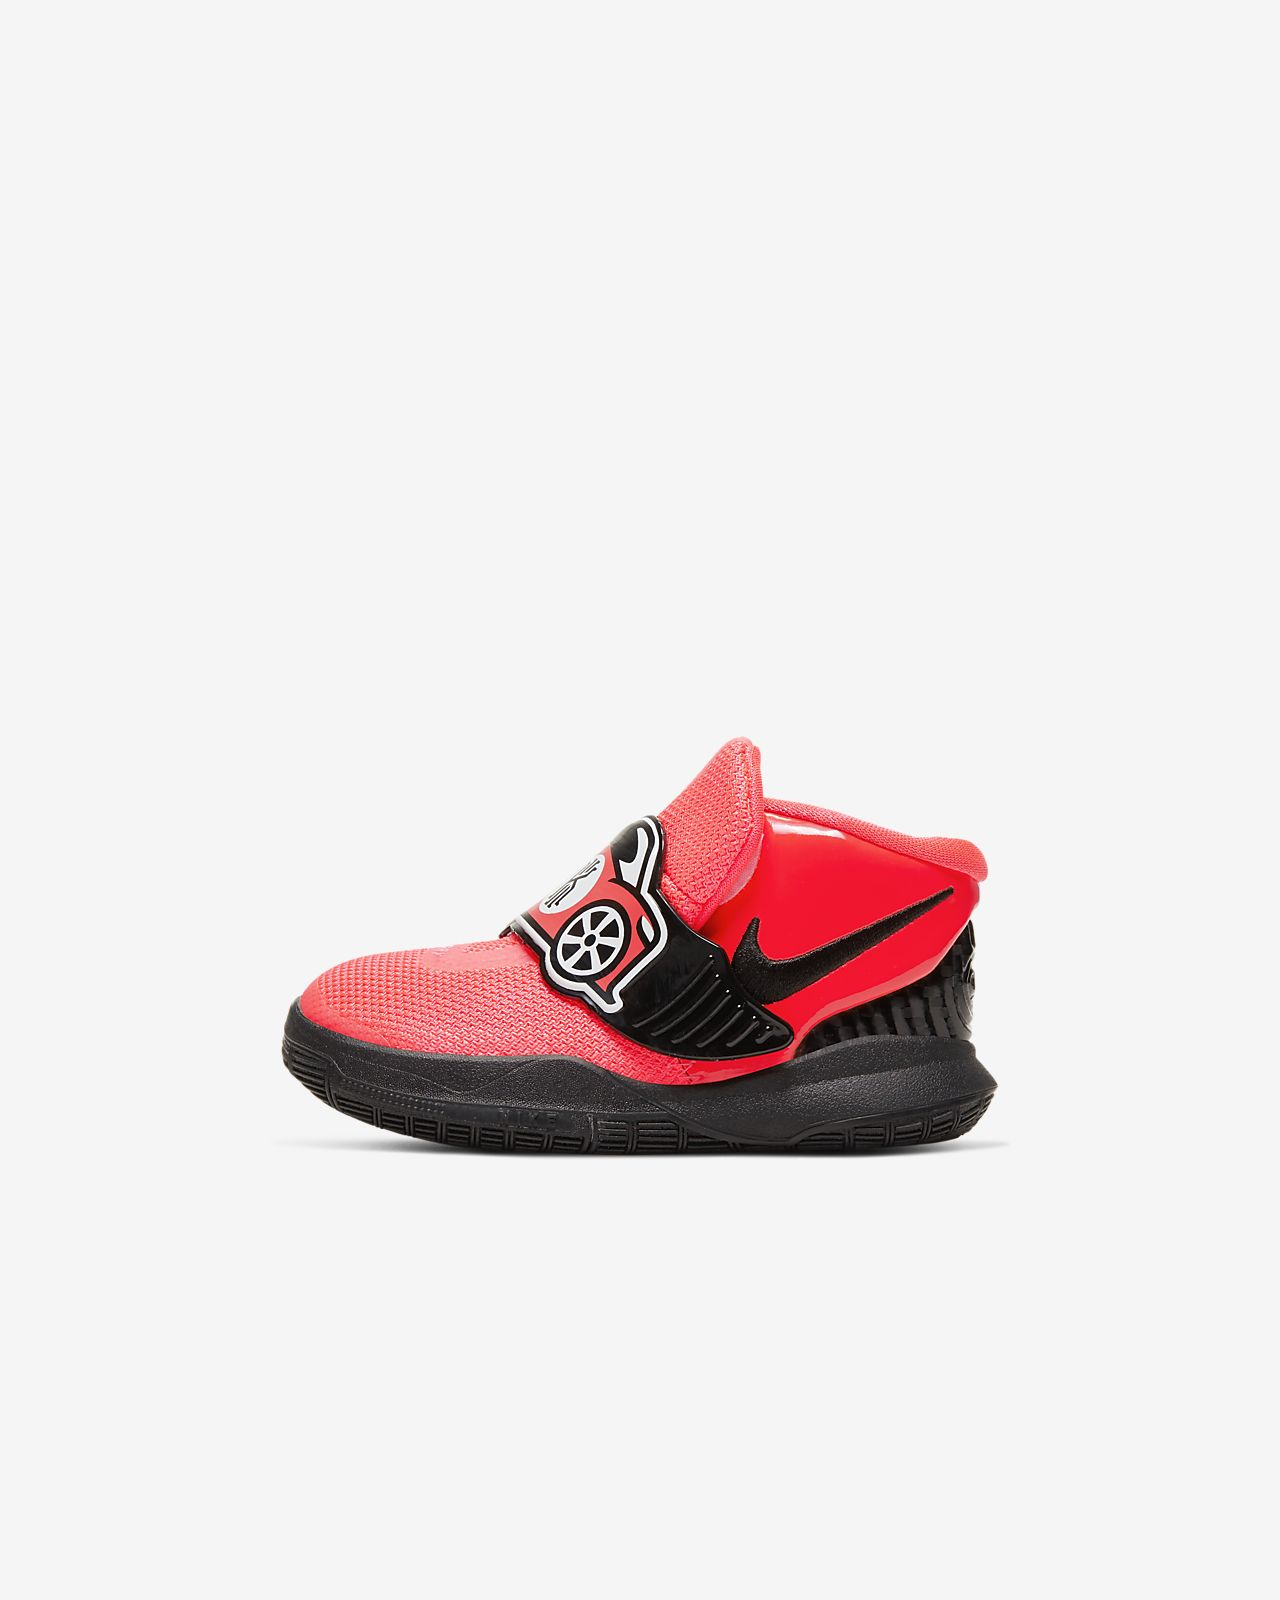 Kyrie 6 Super Vroom 嬰幼兒鞋款